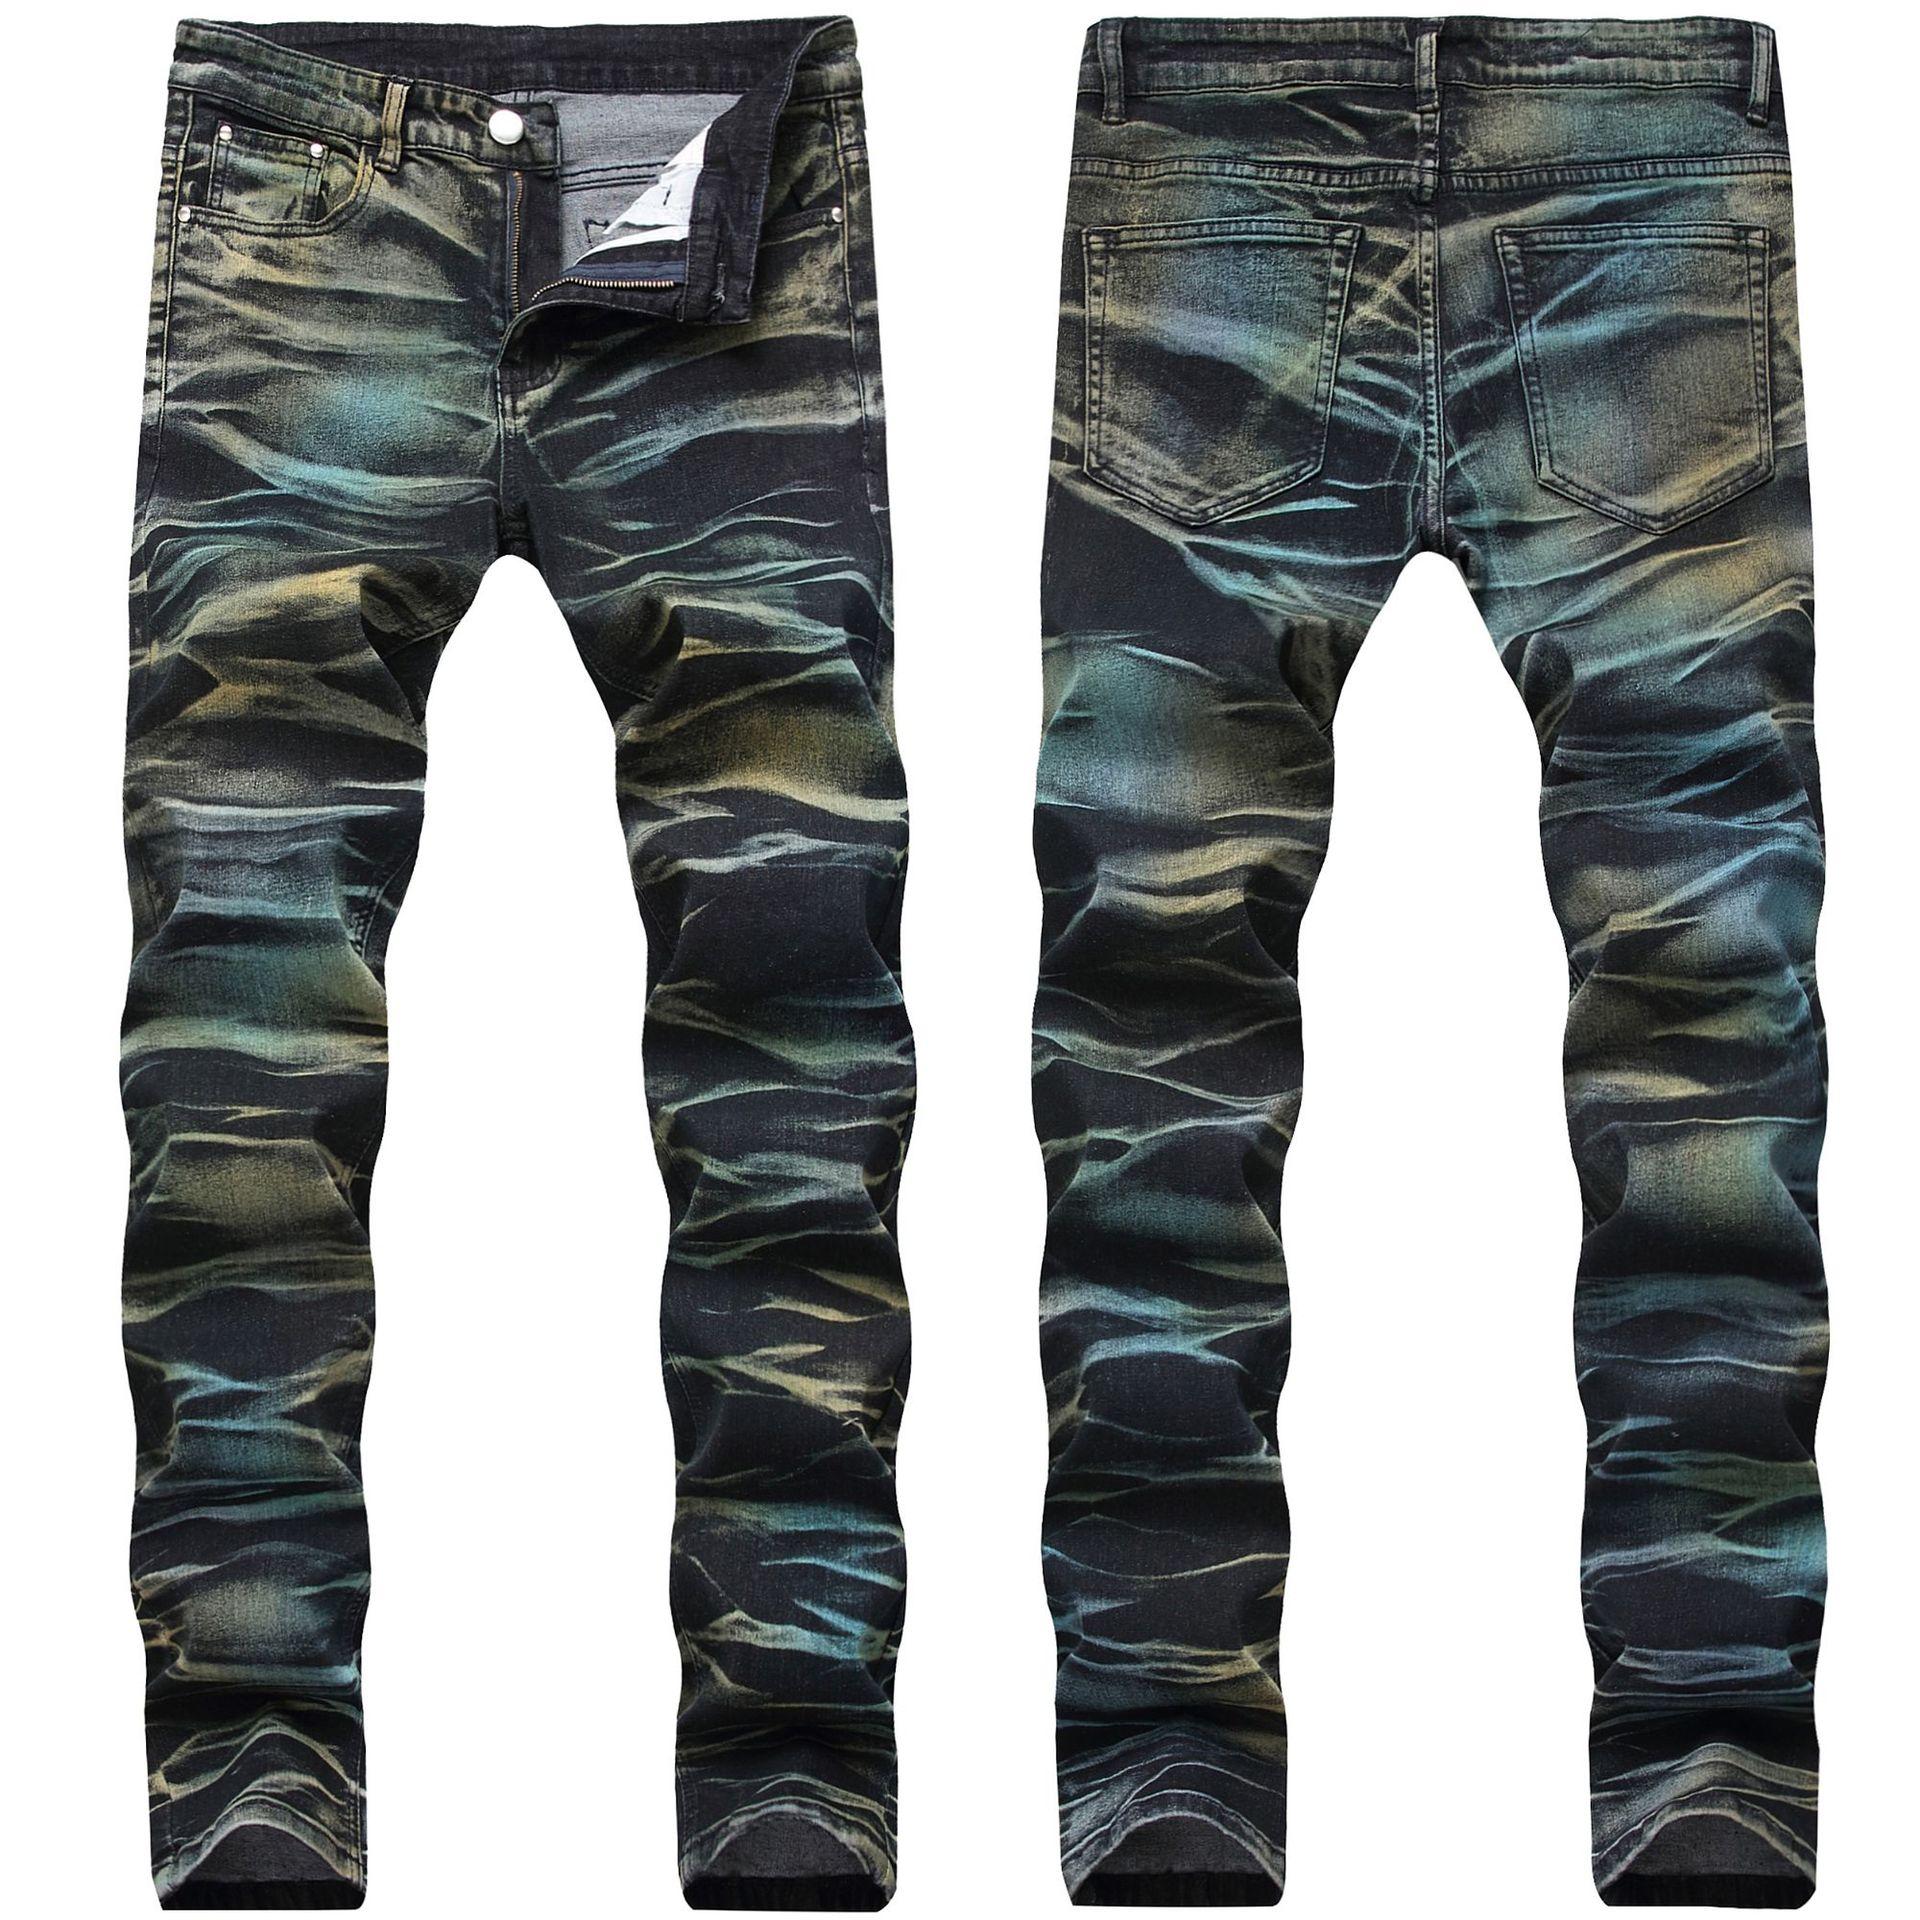 Original Design 2020 New Elastic Jeans Men's Pants Long Men Fashion Painted Jeans Stretch Straight Slim Printed Denim Trousers